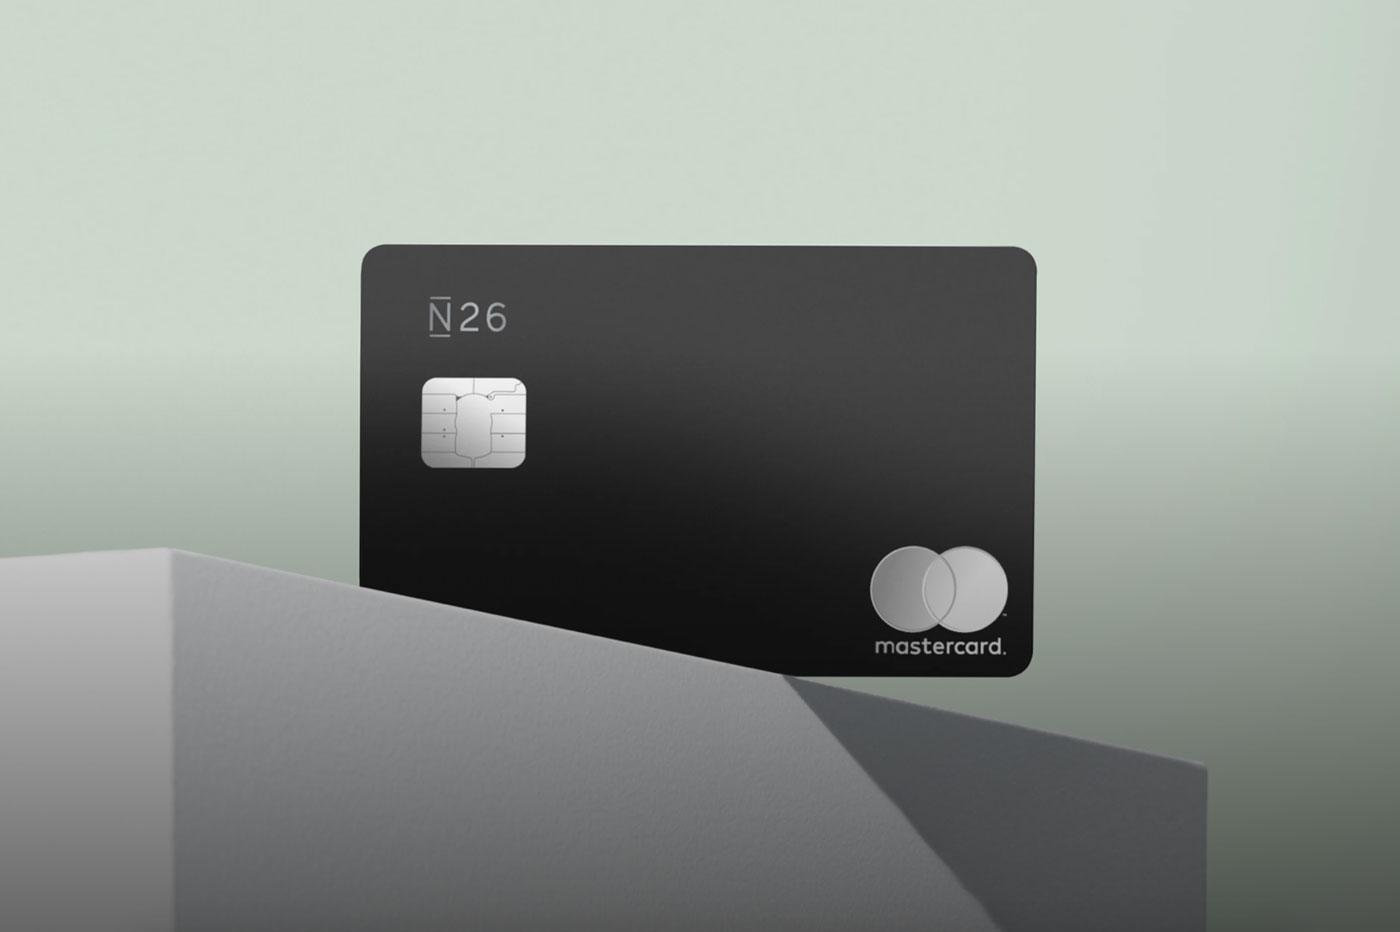 Banque mobile N26